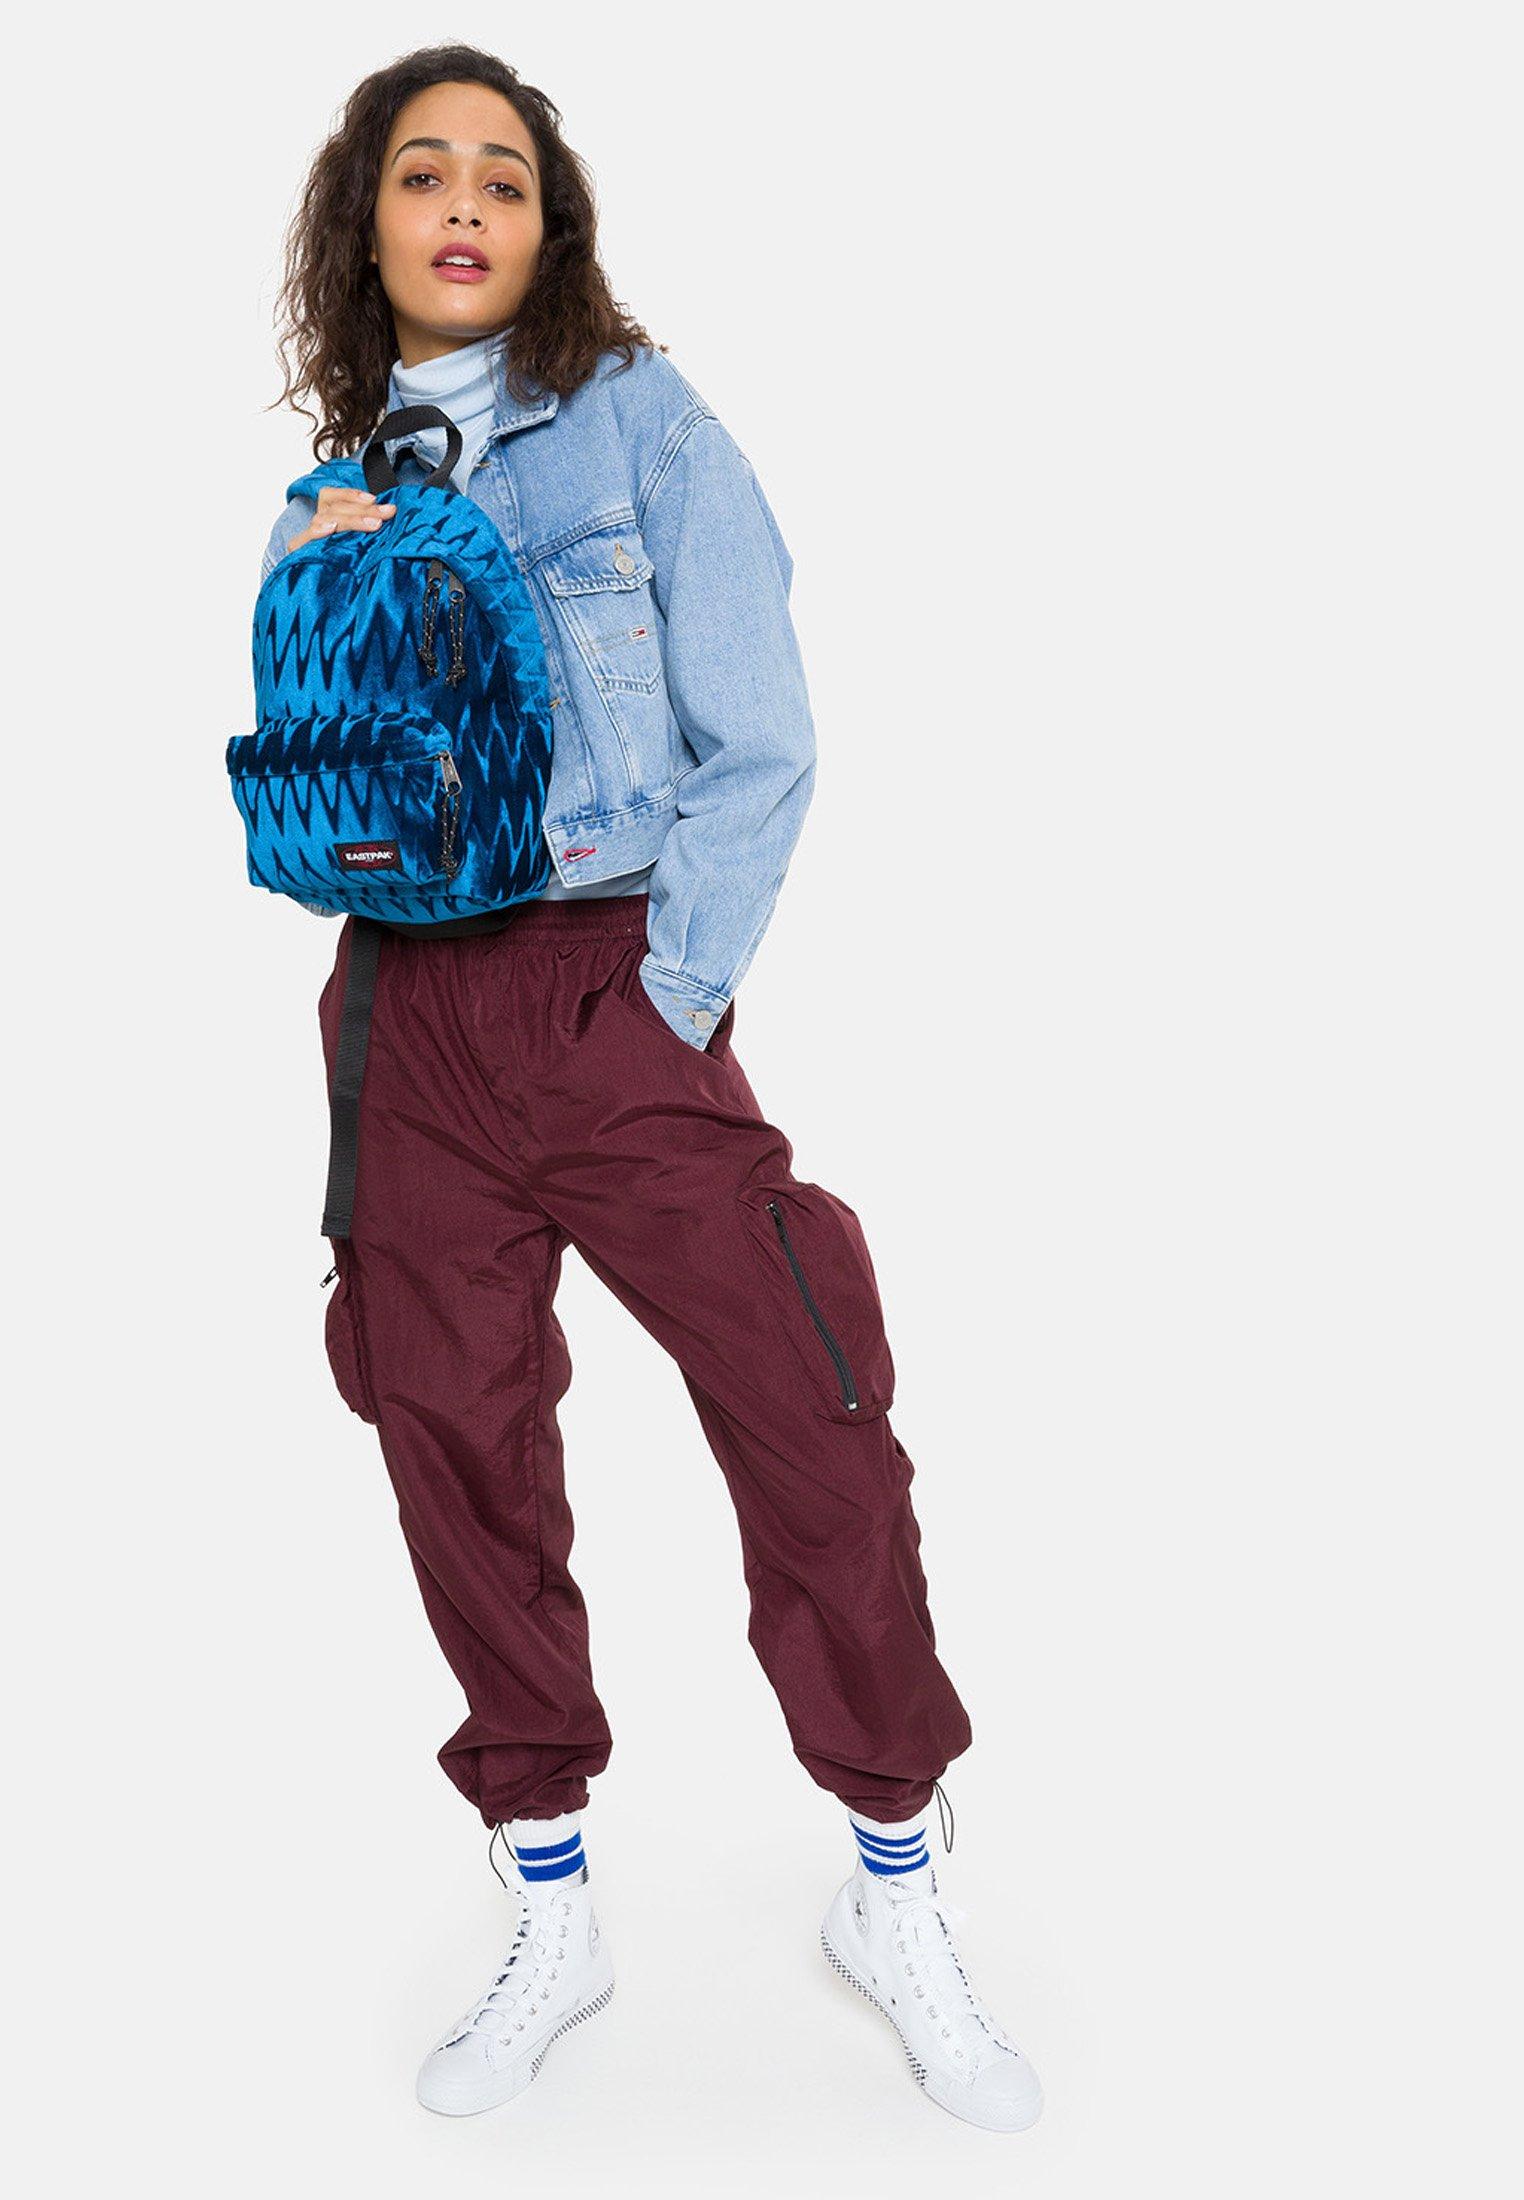 Eastpak Zaino - velvet blue - Borse & Accessori da donna Offerte